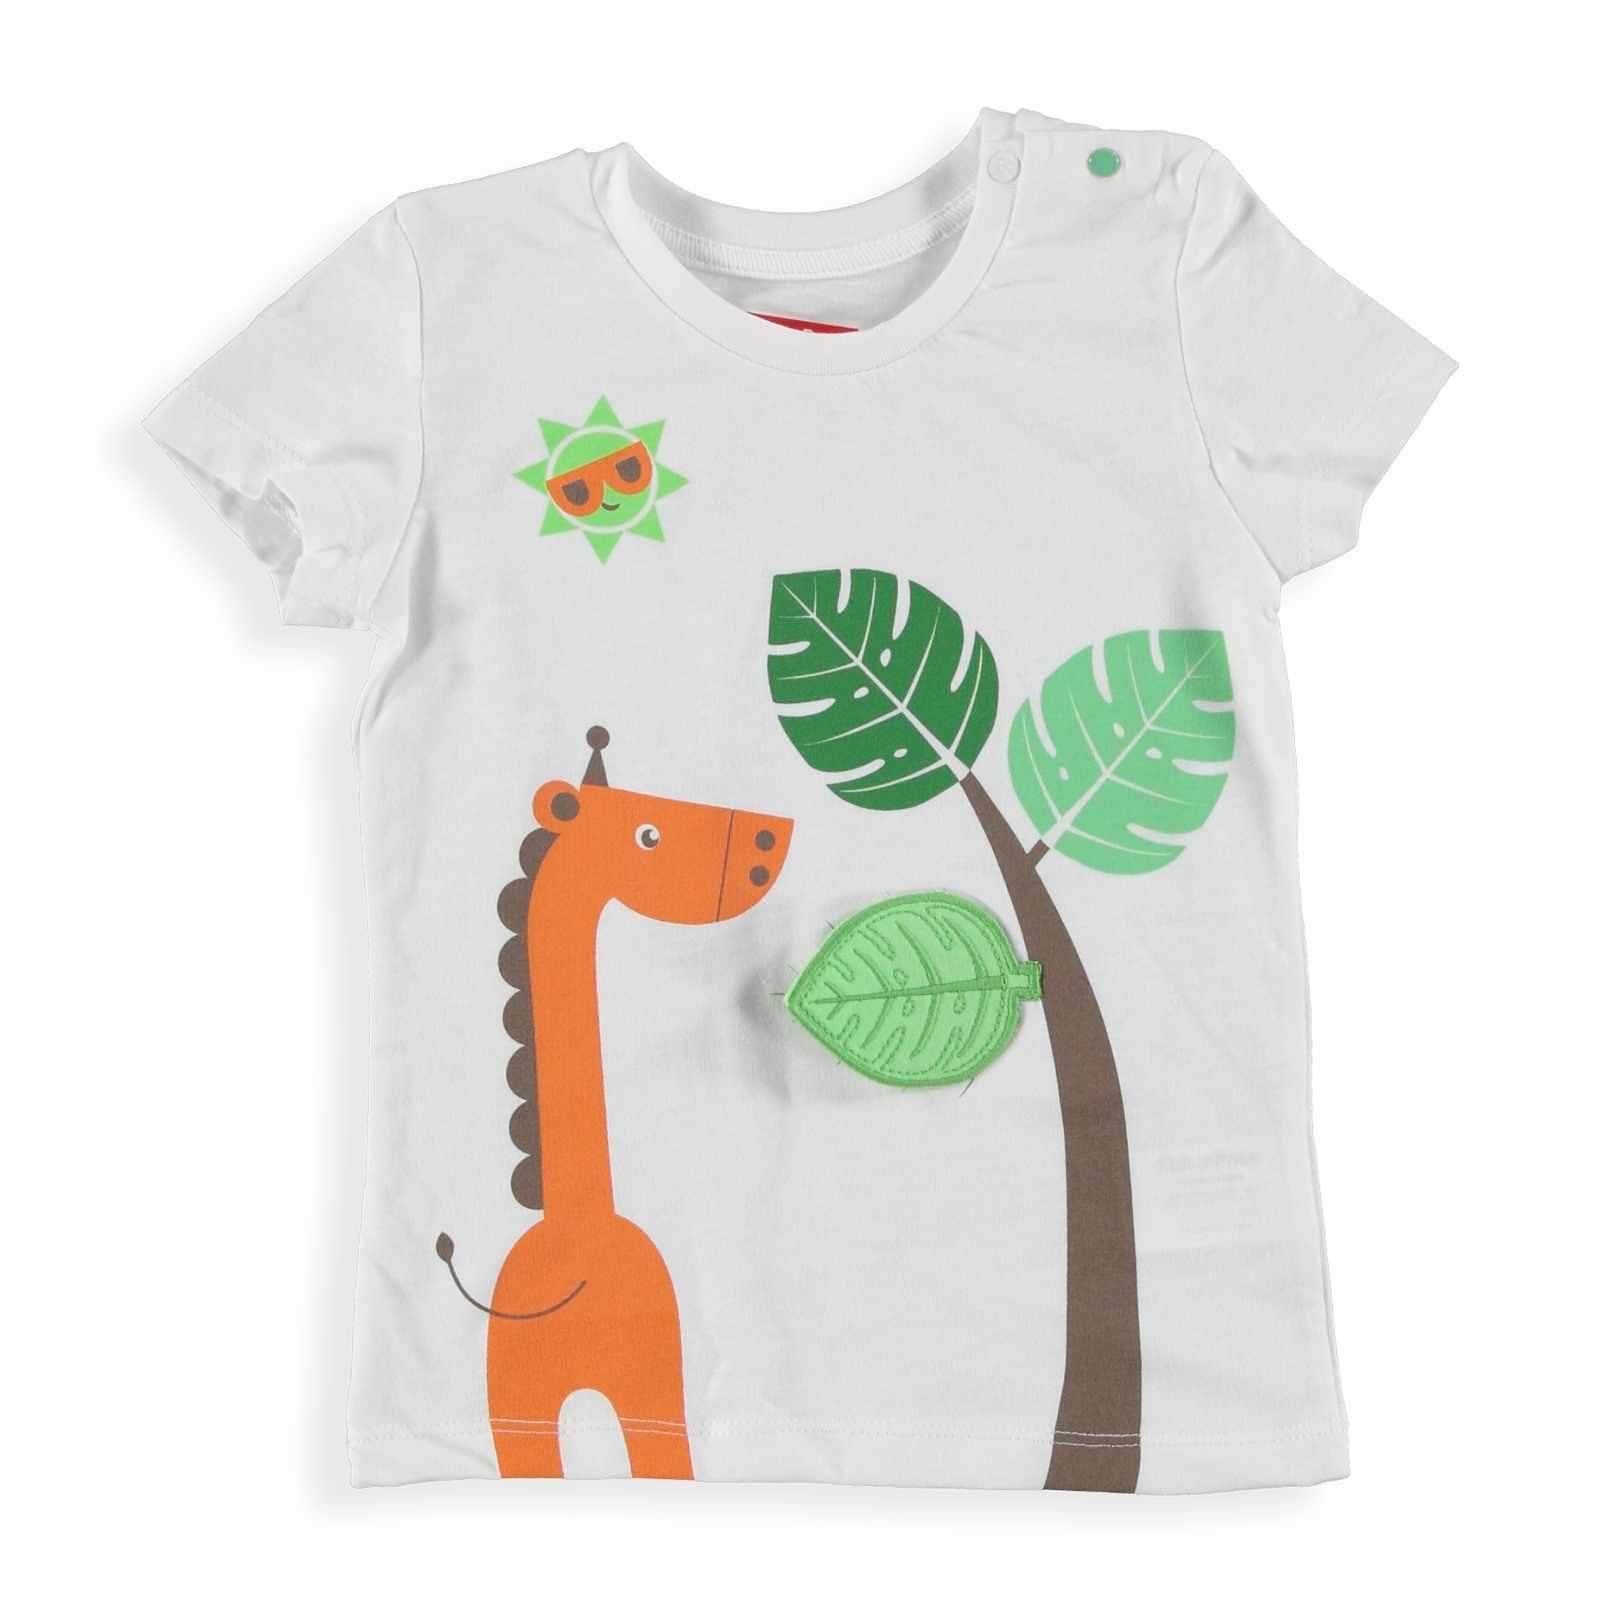 Ebebek פישר מחיר יער תינוק ילד מודפס חולצת טי